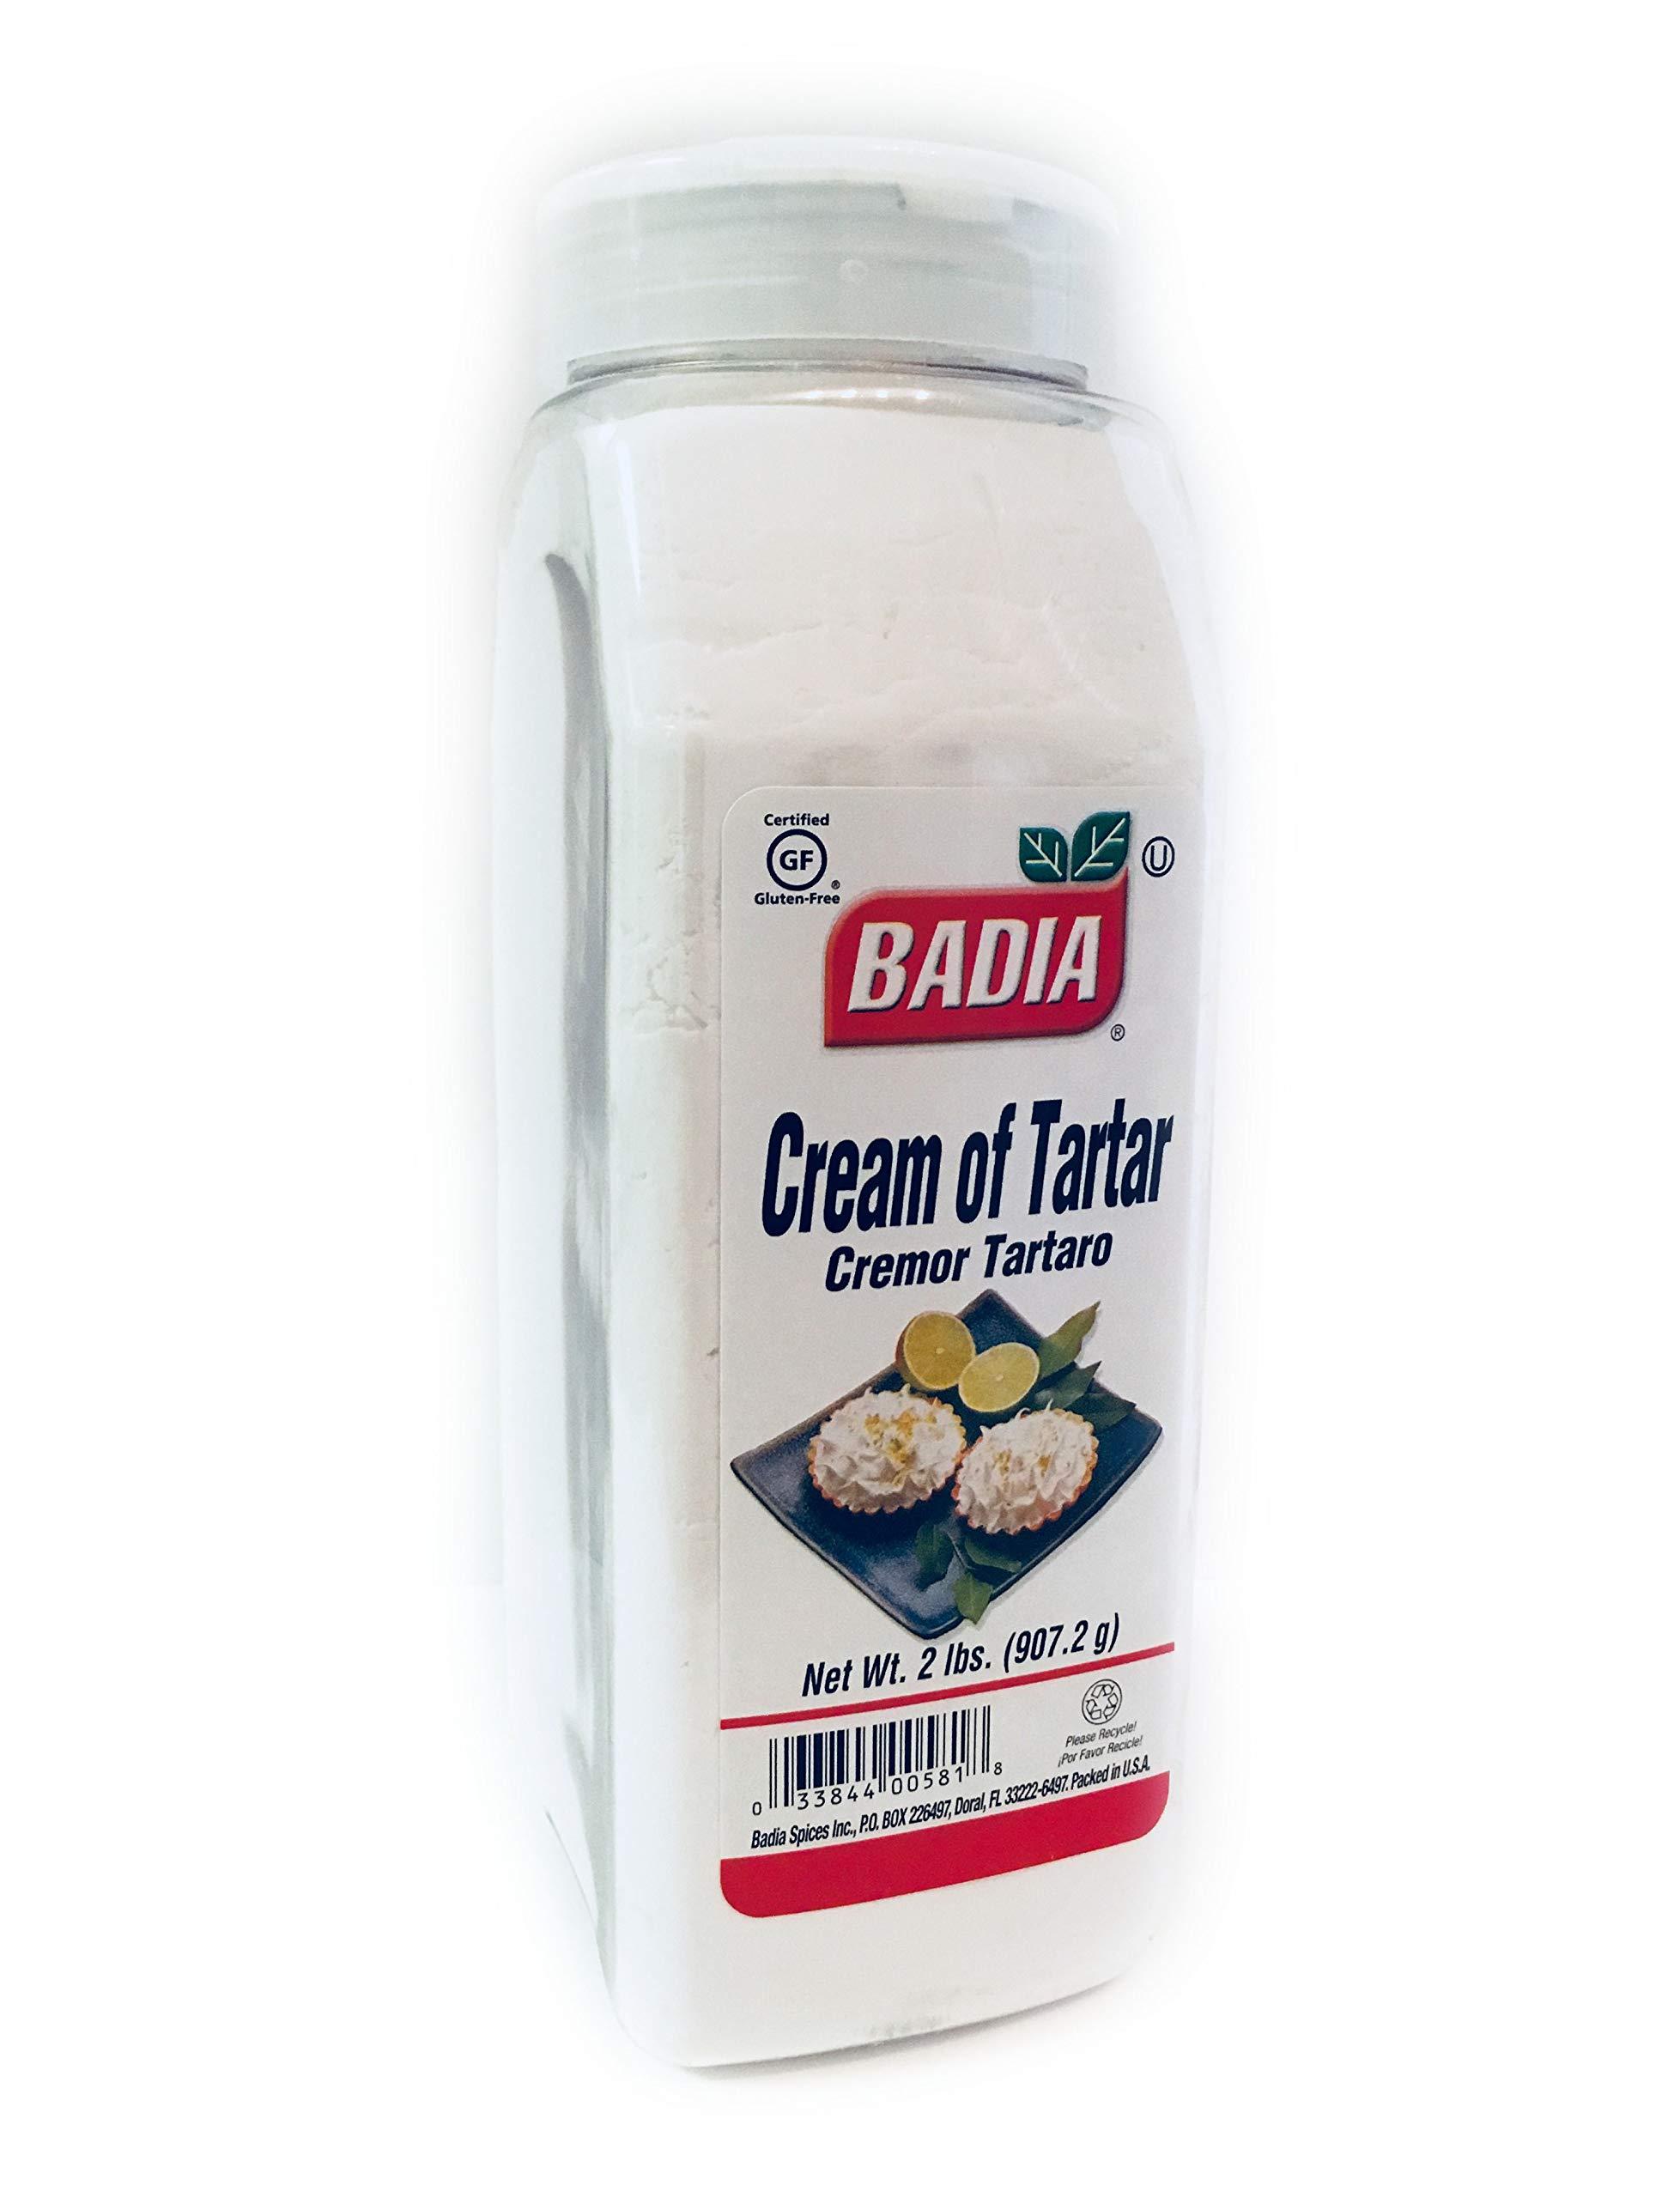 2 lbs-Cream of Tartar Powder/Cremor de Tartaro Gluten Free Kosher